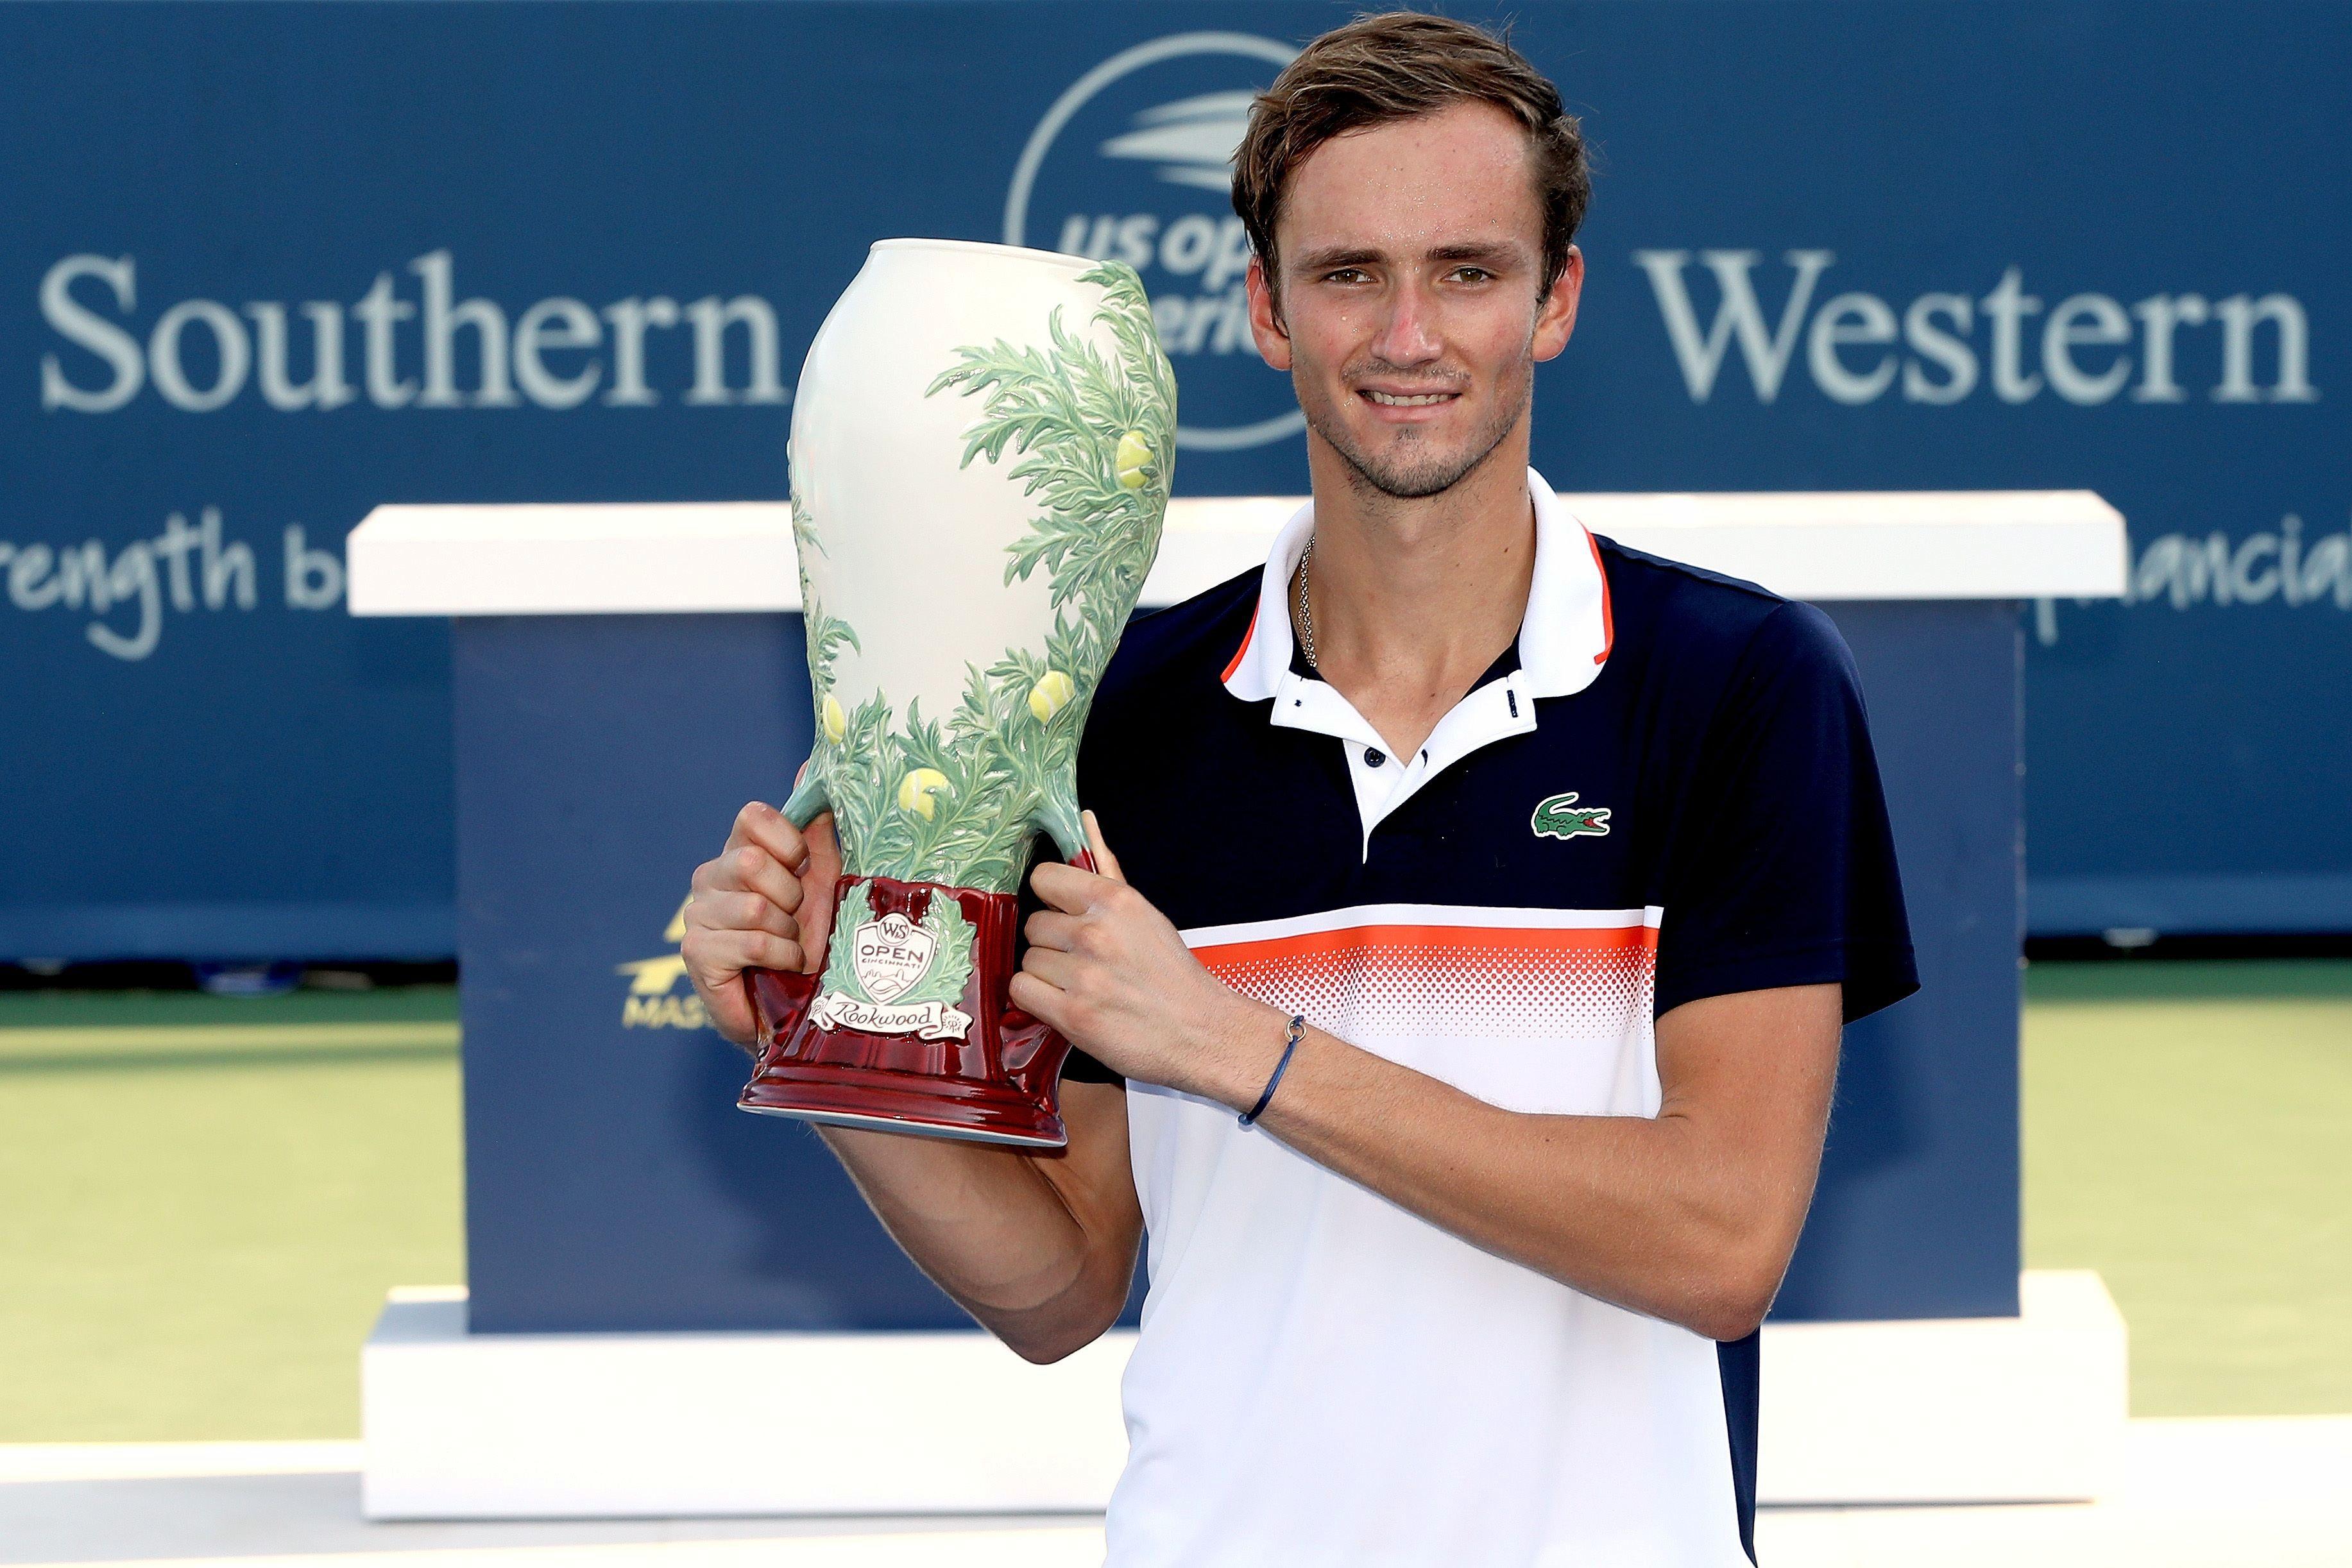 Tennis - ATP - Cincinnati : Daniil Medvedev remporte son premier Masters 1000